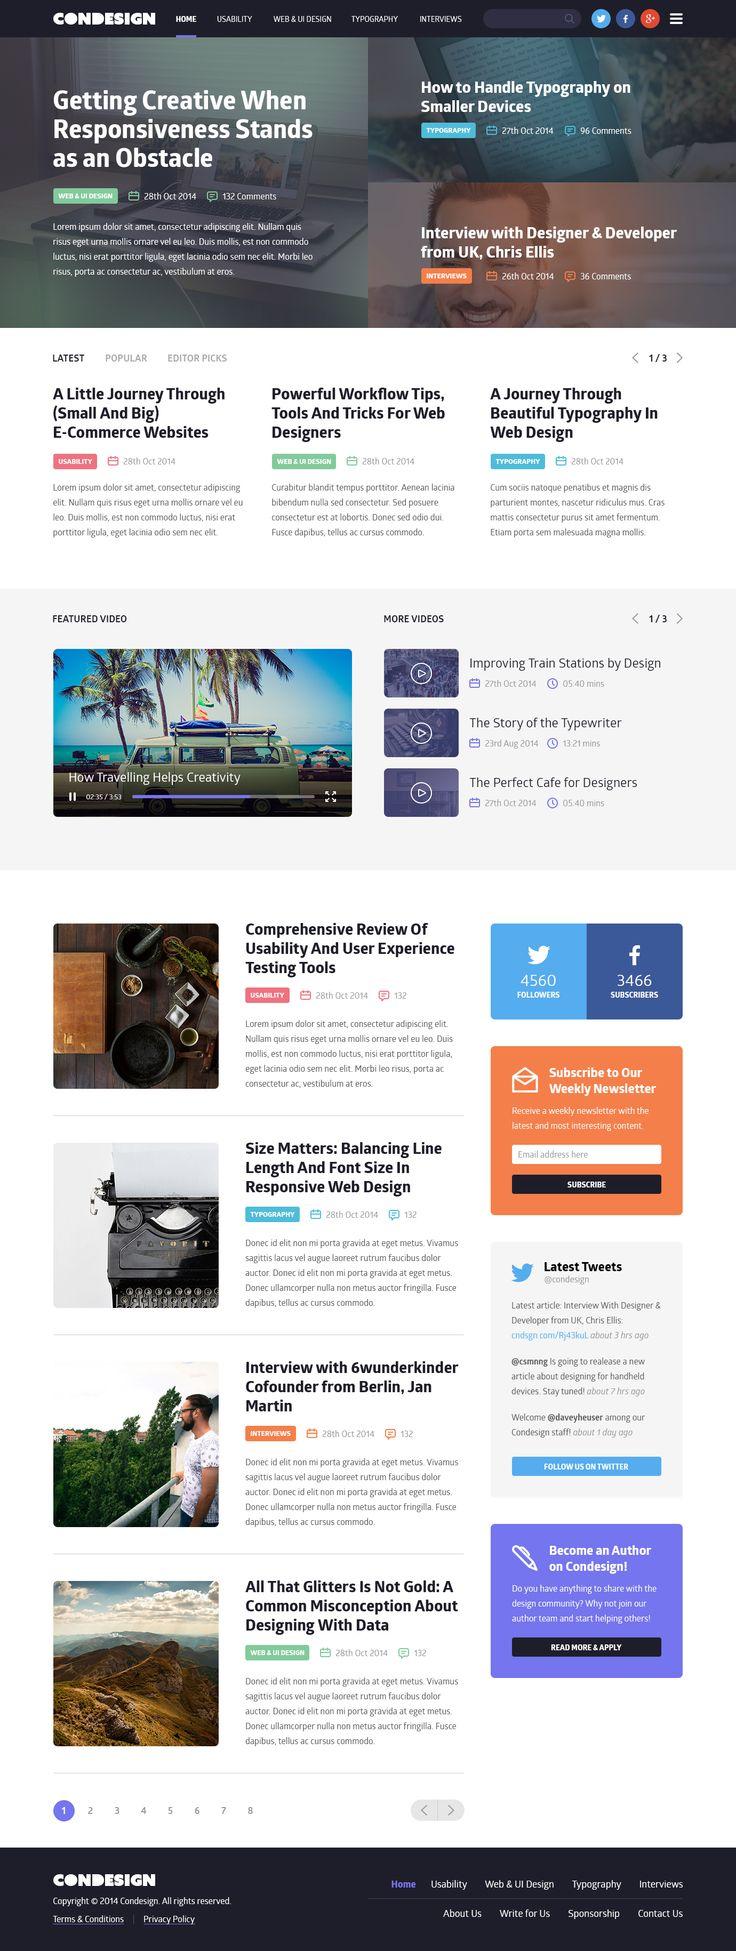 Condesign Blog Concept #blog #website #web [www.pinterest.com/loganless]